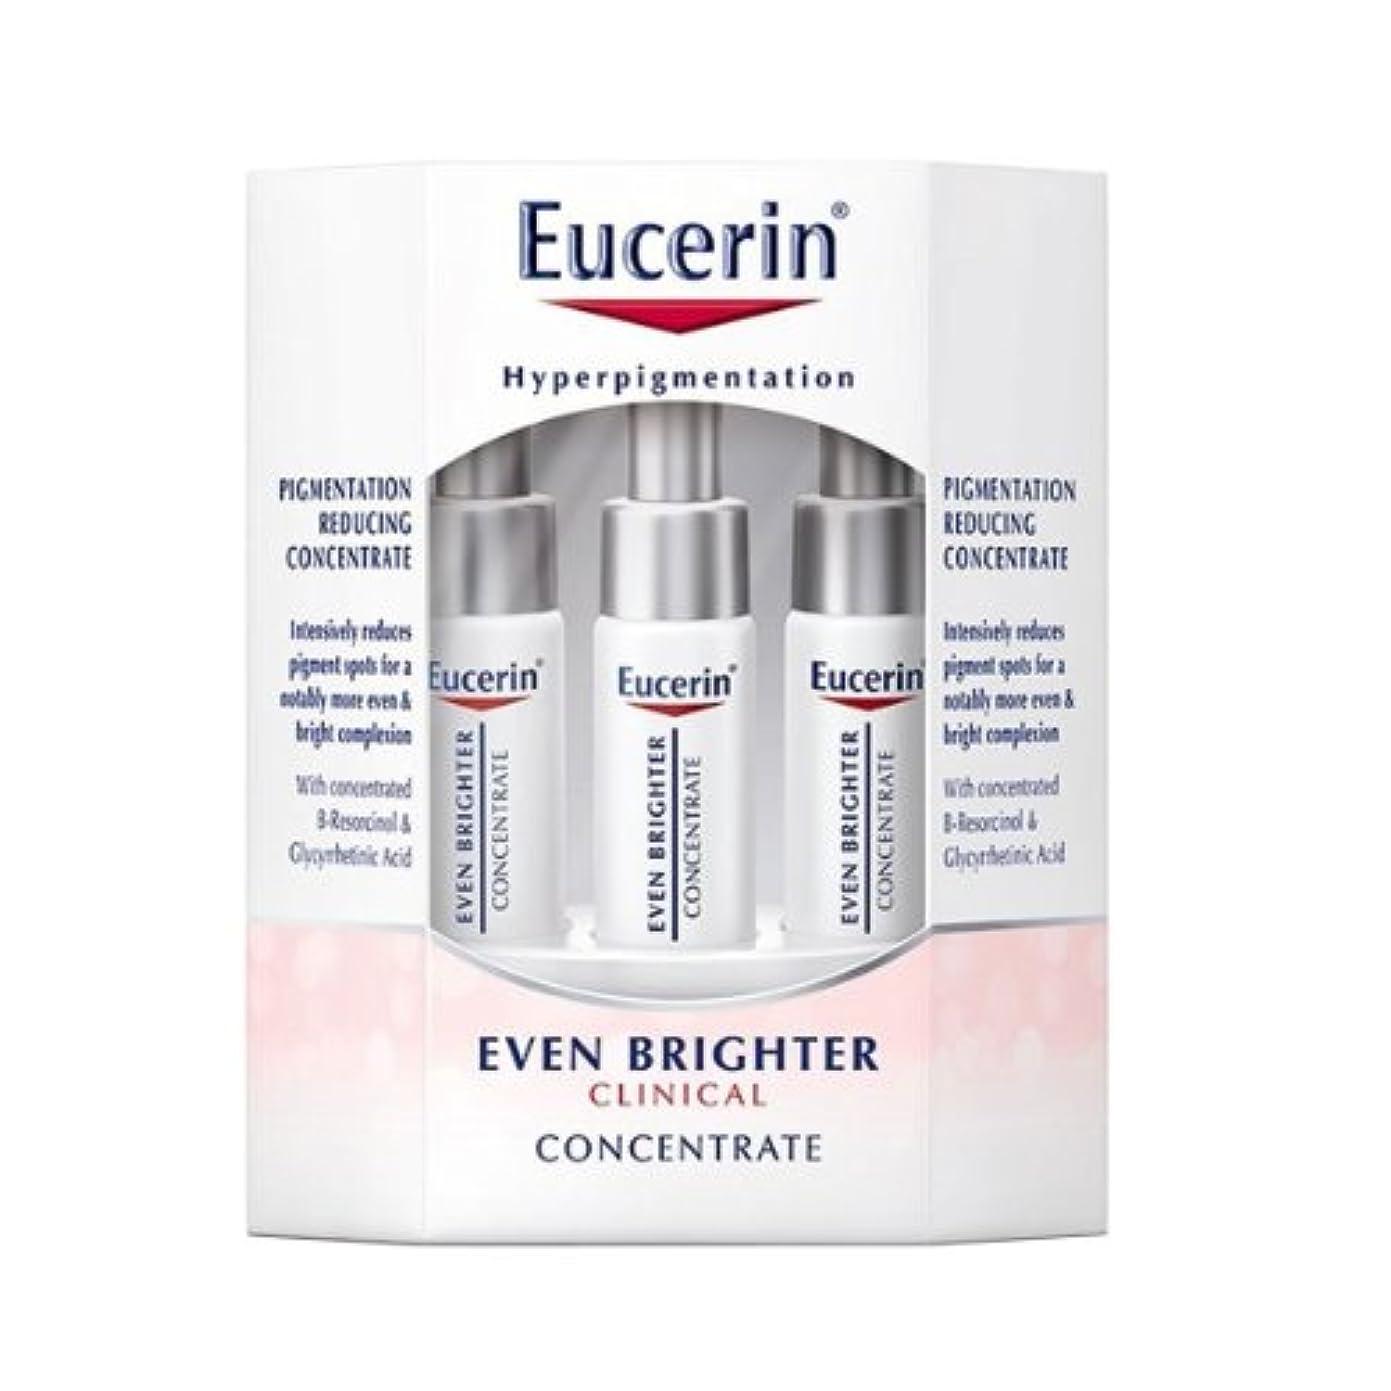 等感度海軍Eucerin Even Brighter Concentrate 6x5ml [並行輸入品]